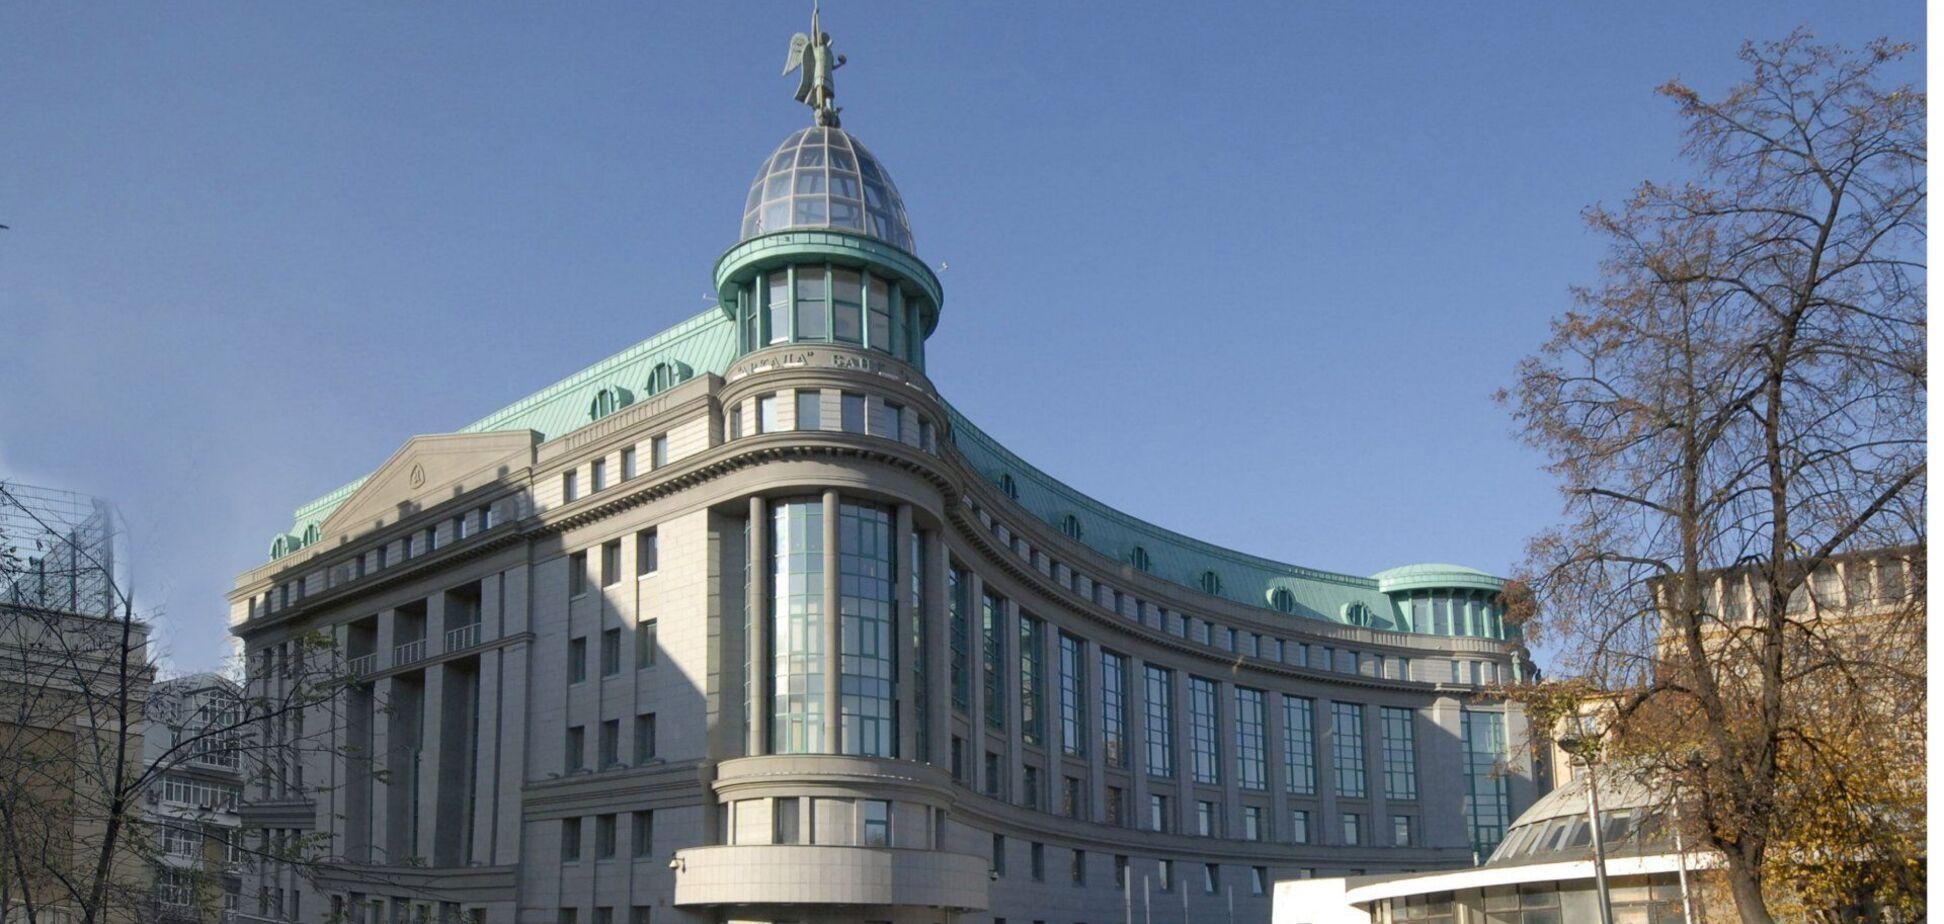 В Киеве сняли арест с главного офиса обанкротившегося банка 'Аркада'